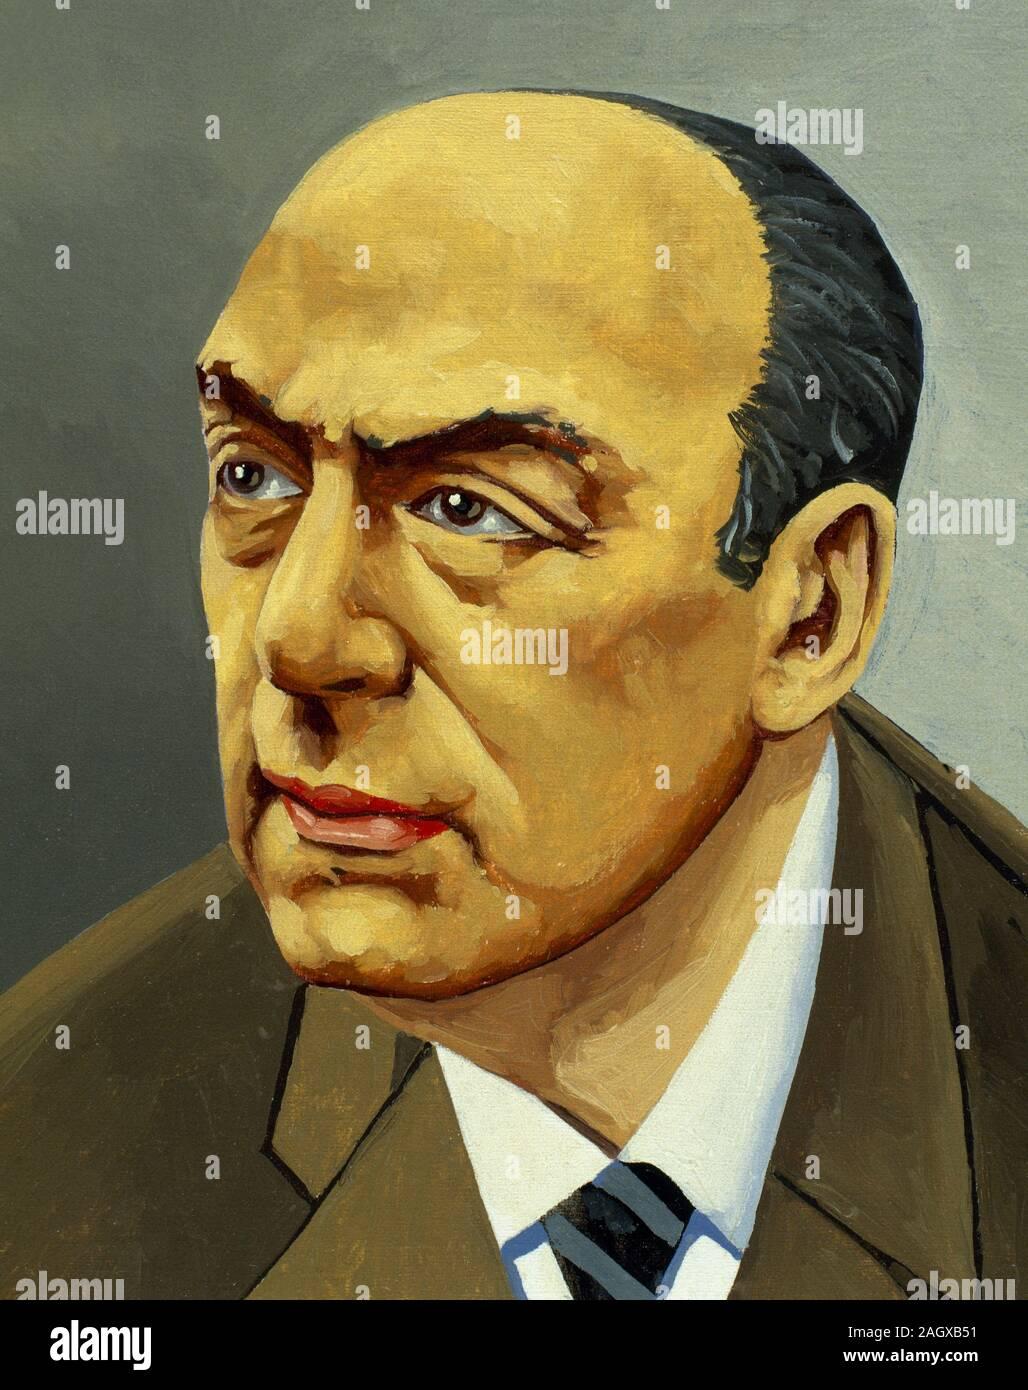 Nobel De Litterature En 1971 : nobel, litterature, Pablo, Neruda, Portrait, Banque, D'image, Photos, Alamy